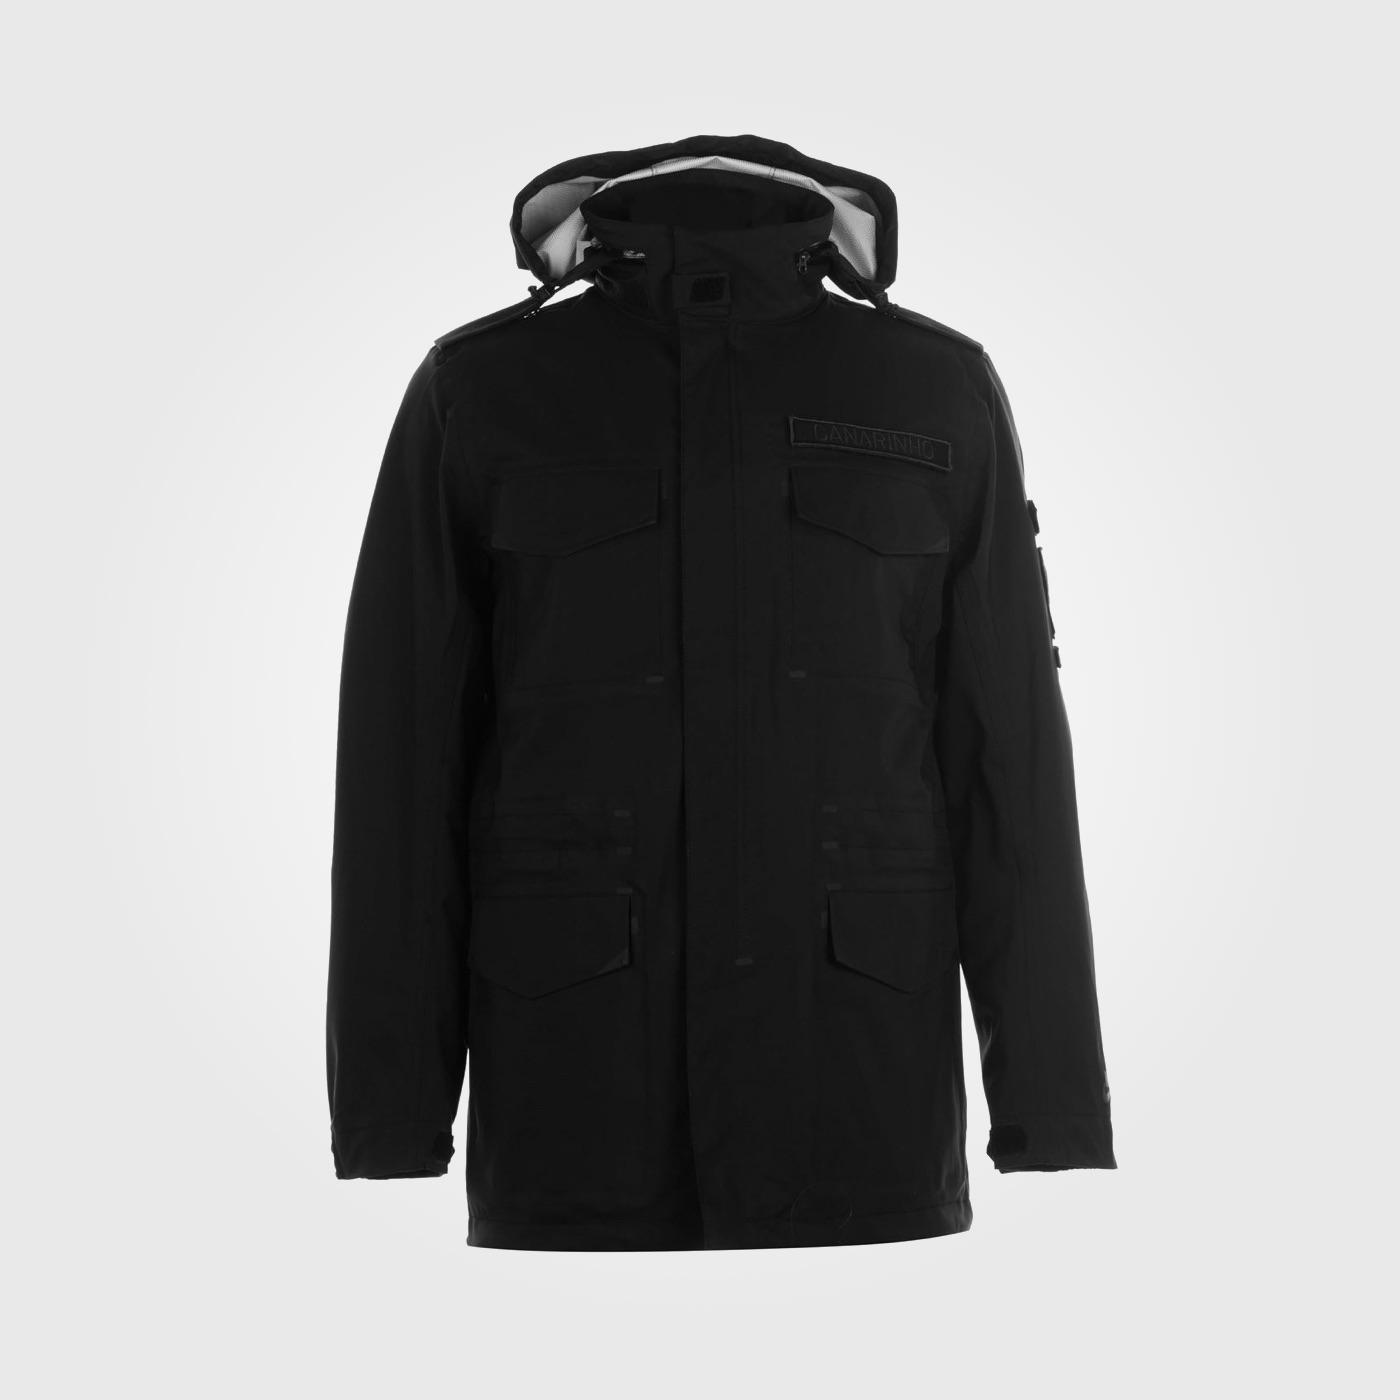 Куртка Nike M65 Canarinho Mens Black 2